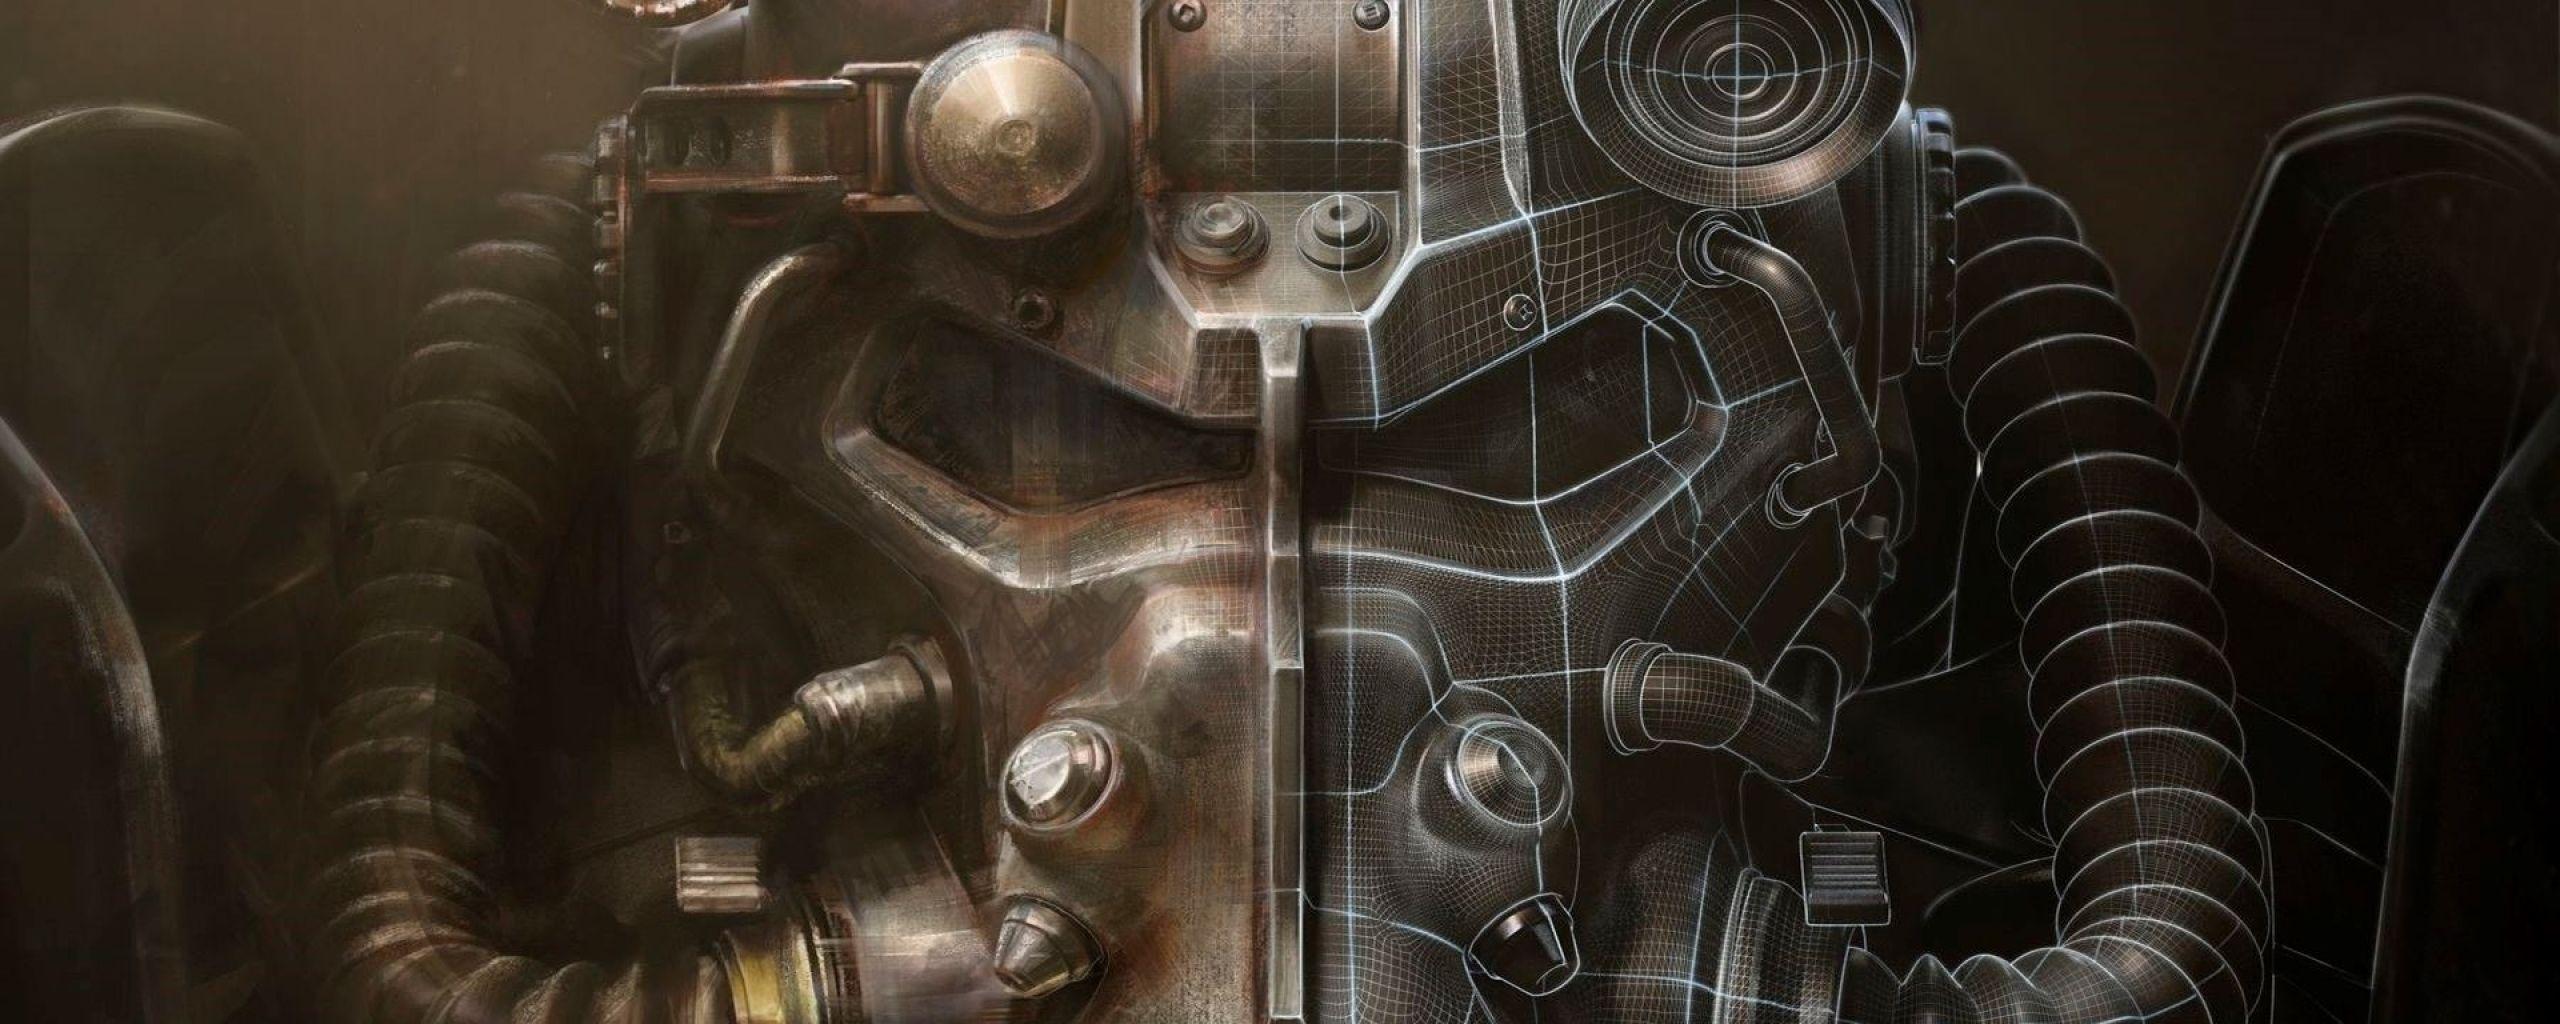 Fallout 4 Dual Monitor Wallpapers - Top Free Fallout 4 Dual